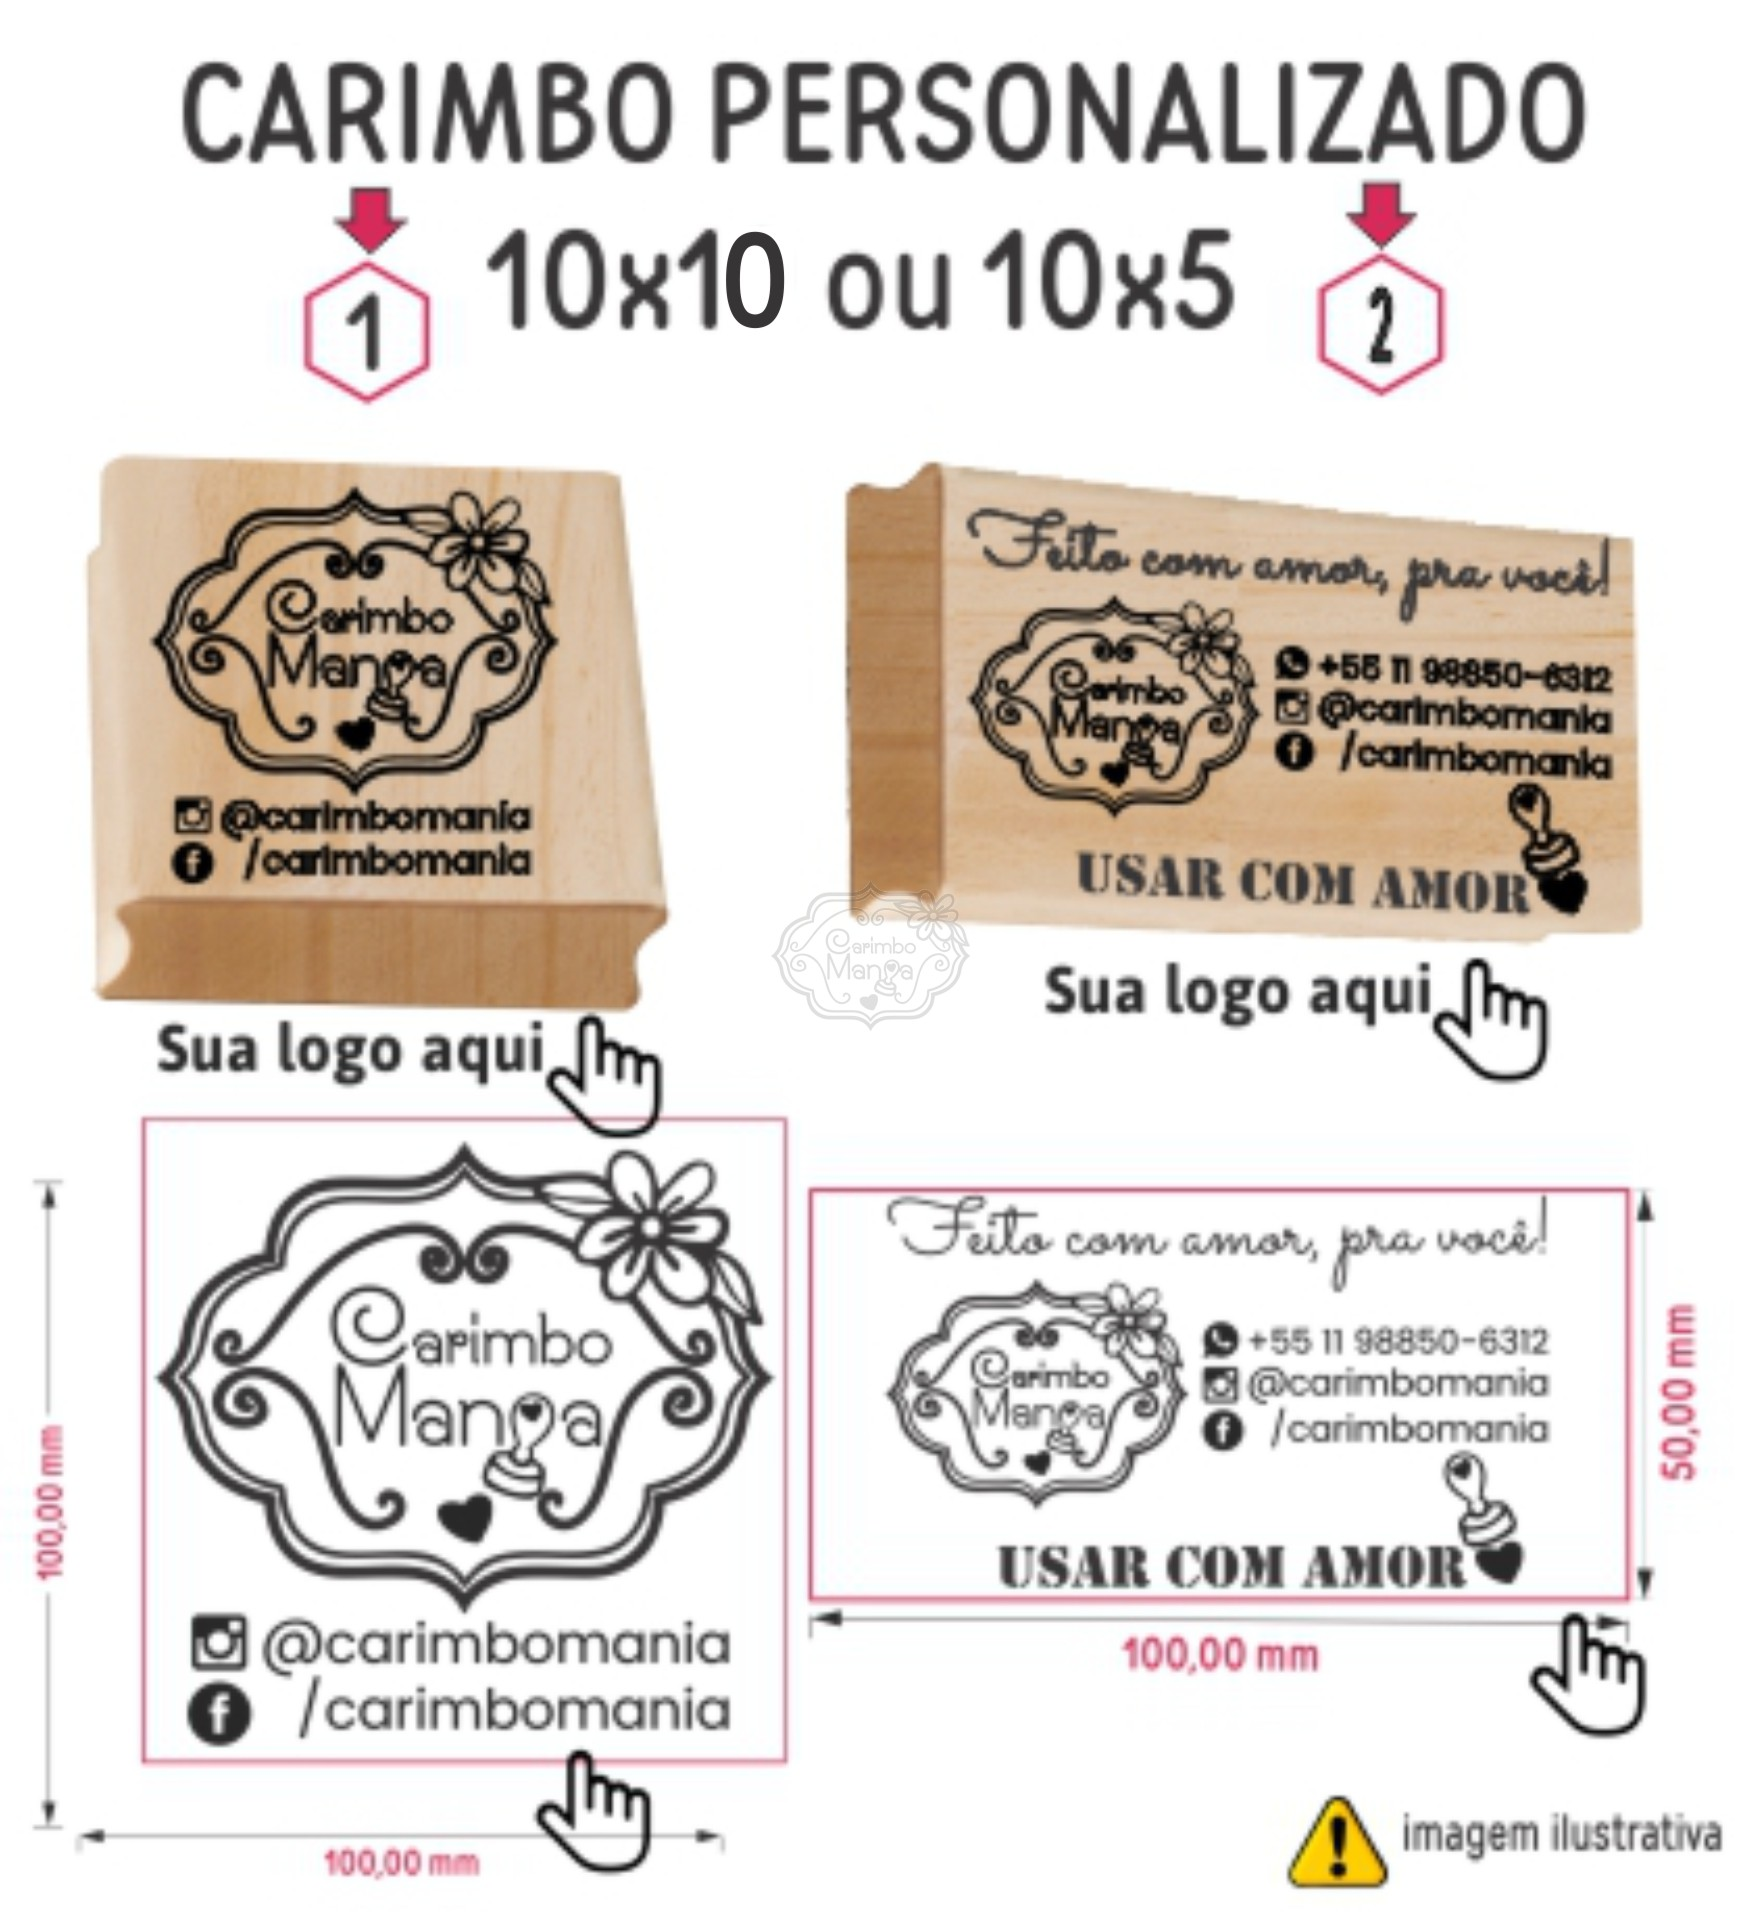 Carimbo Personalizado 10cm a partir de R$74,90